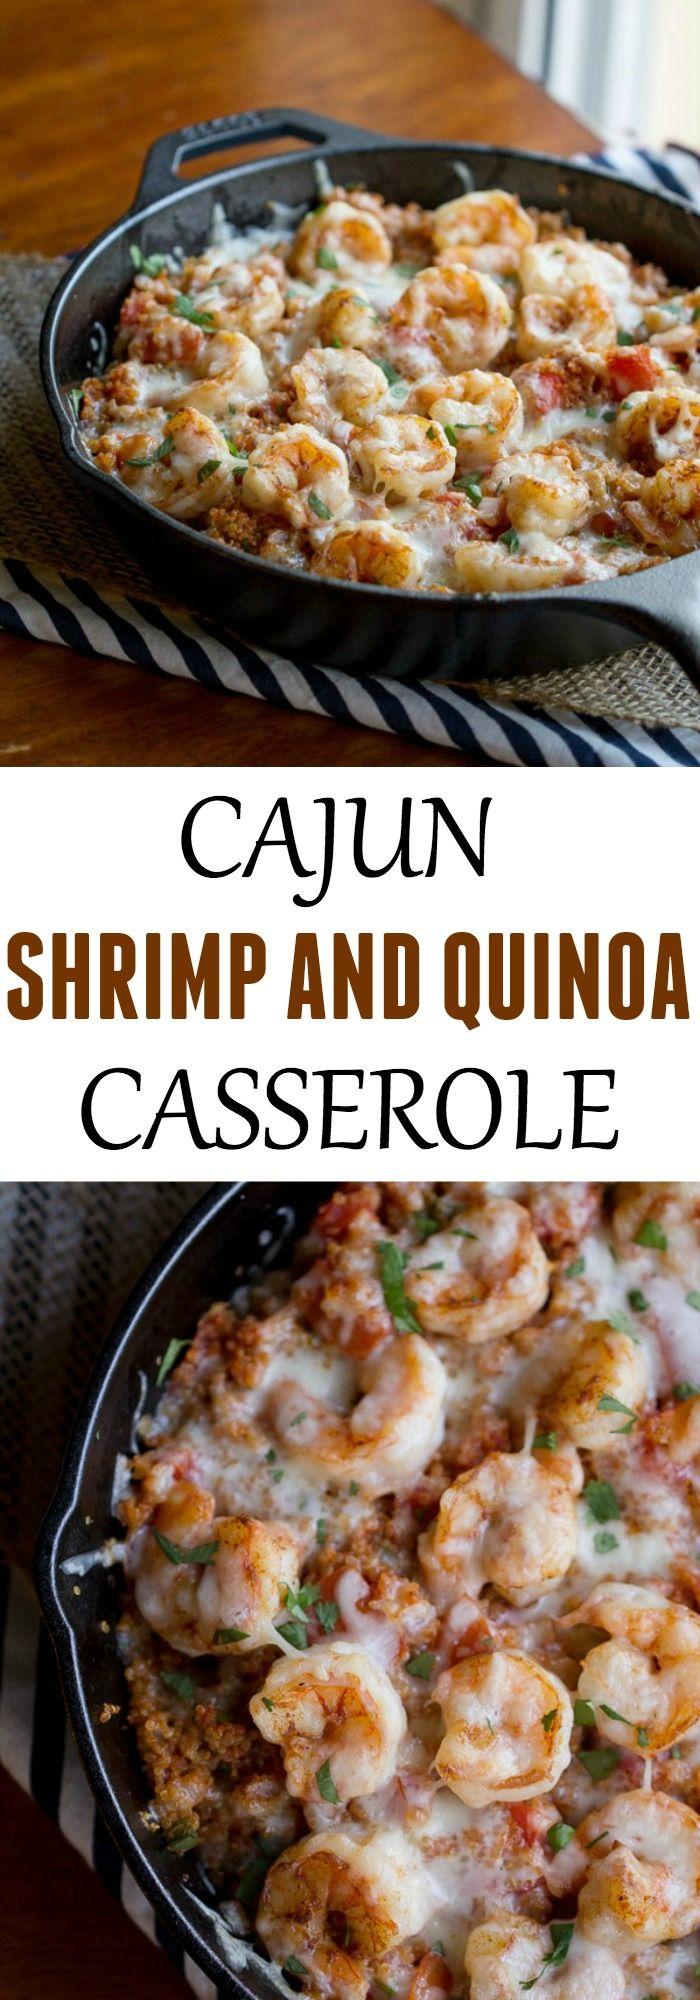 Super simple dinner recipe - Cajun Shrimp and Quinoa Casserole.